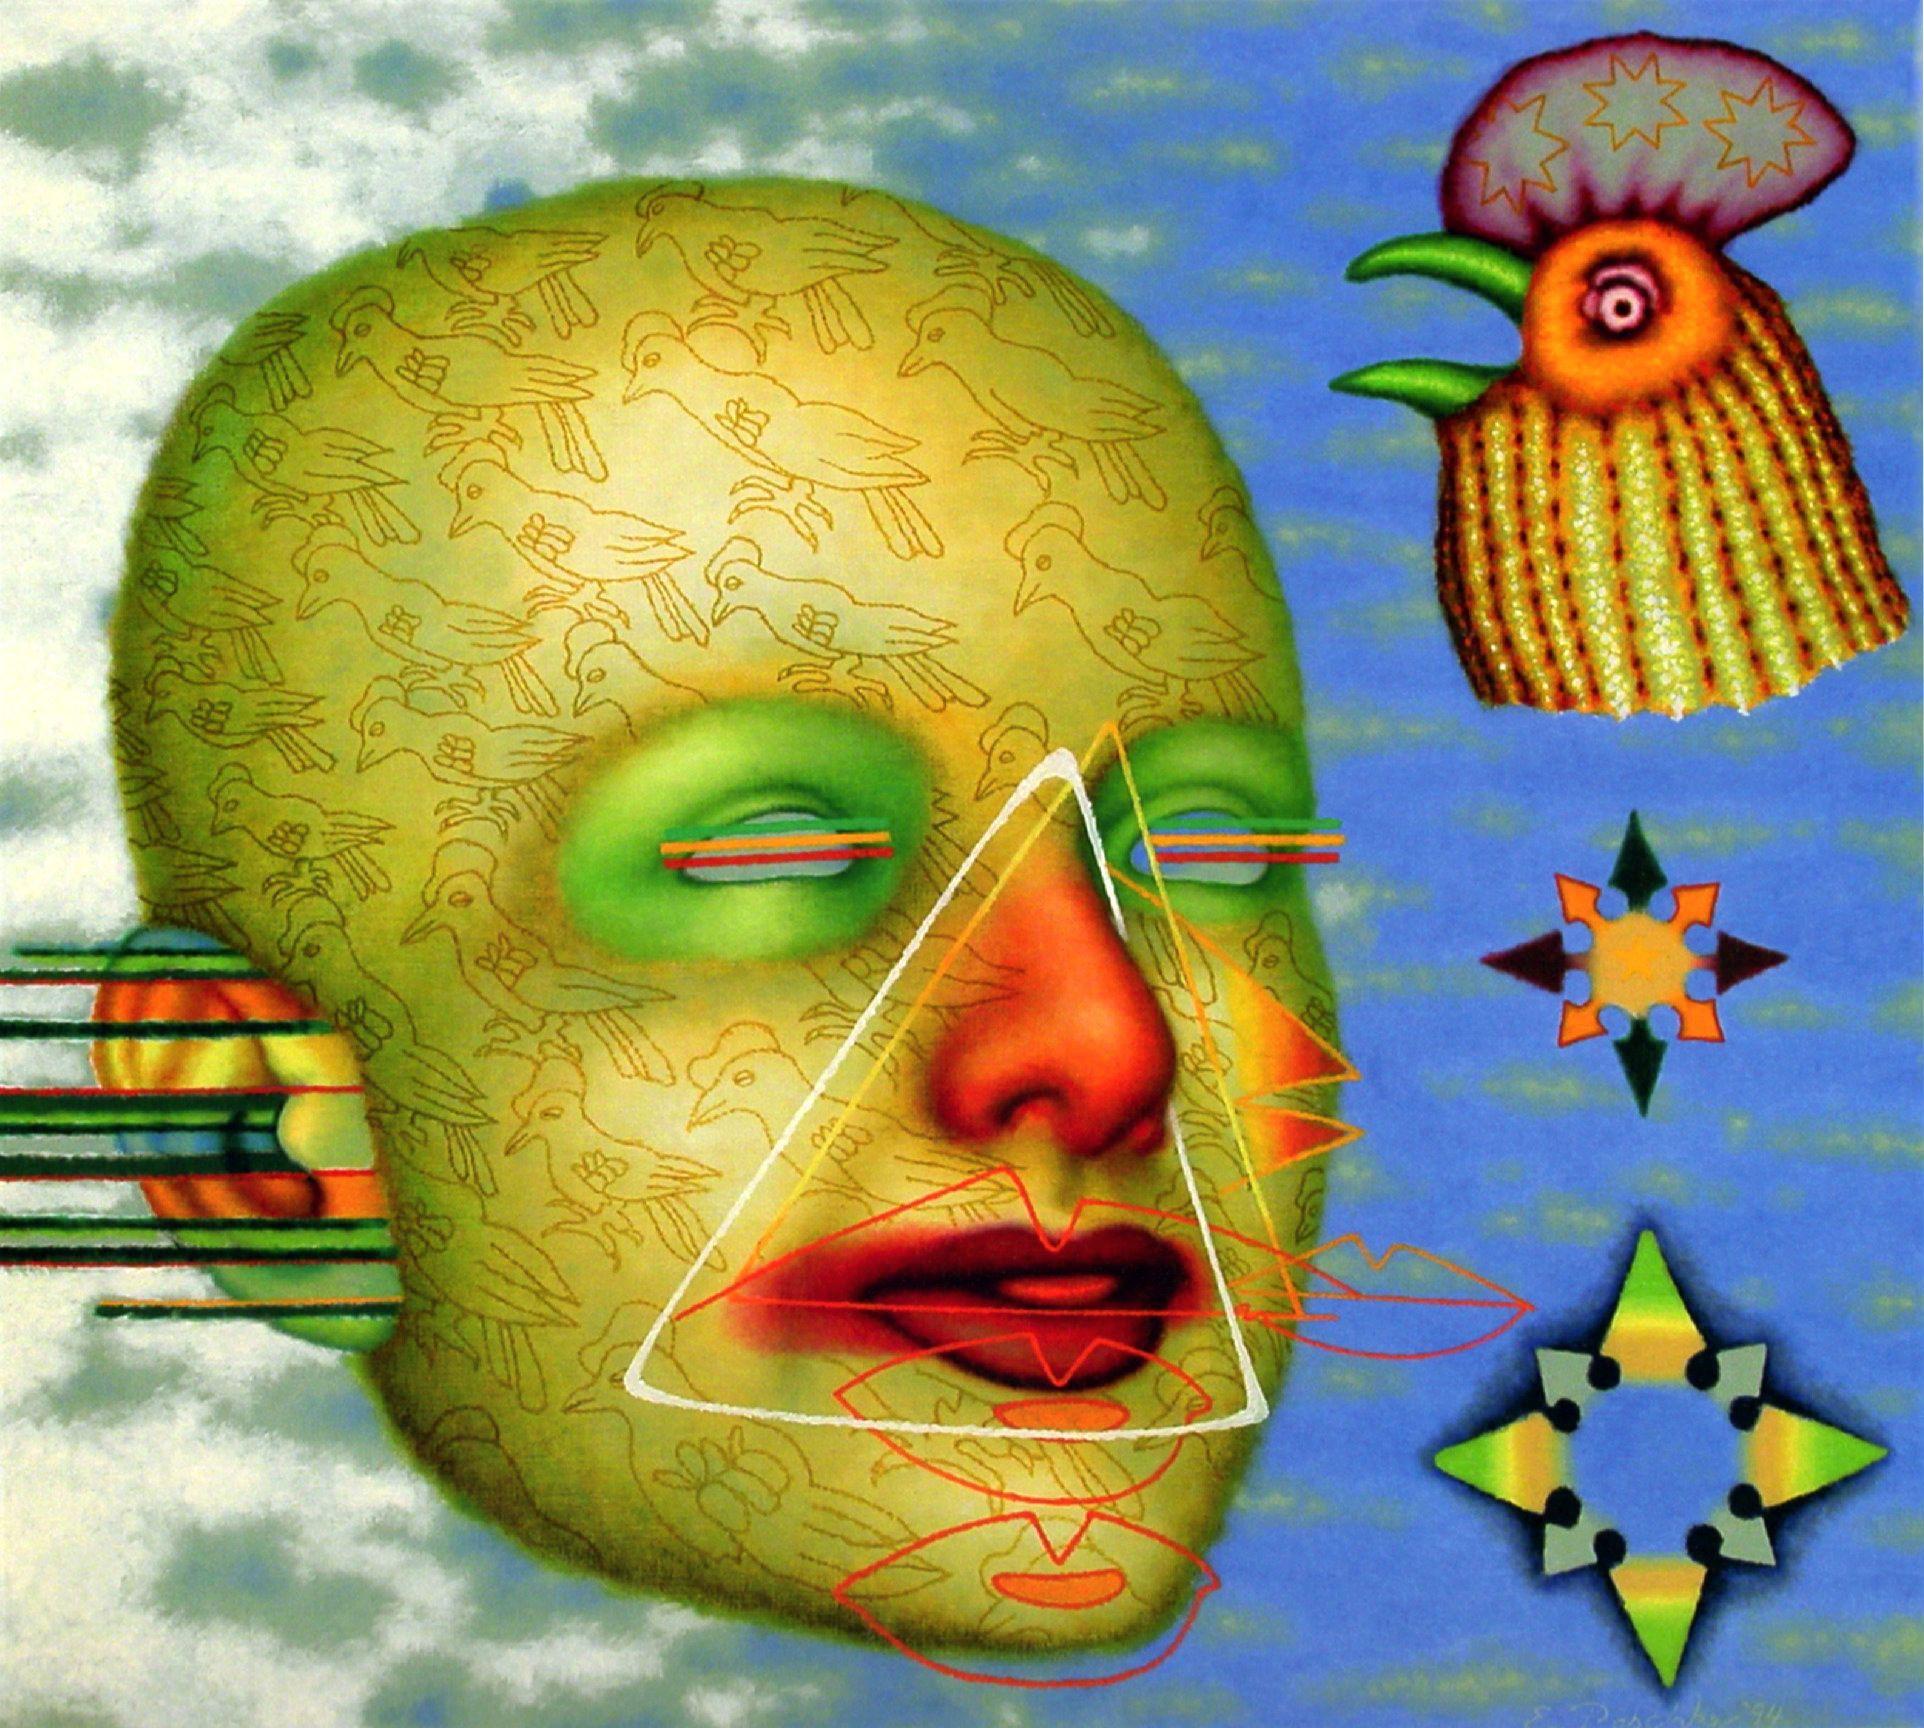 Ed paschke sky blue 1994 chicago artists artist